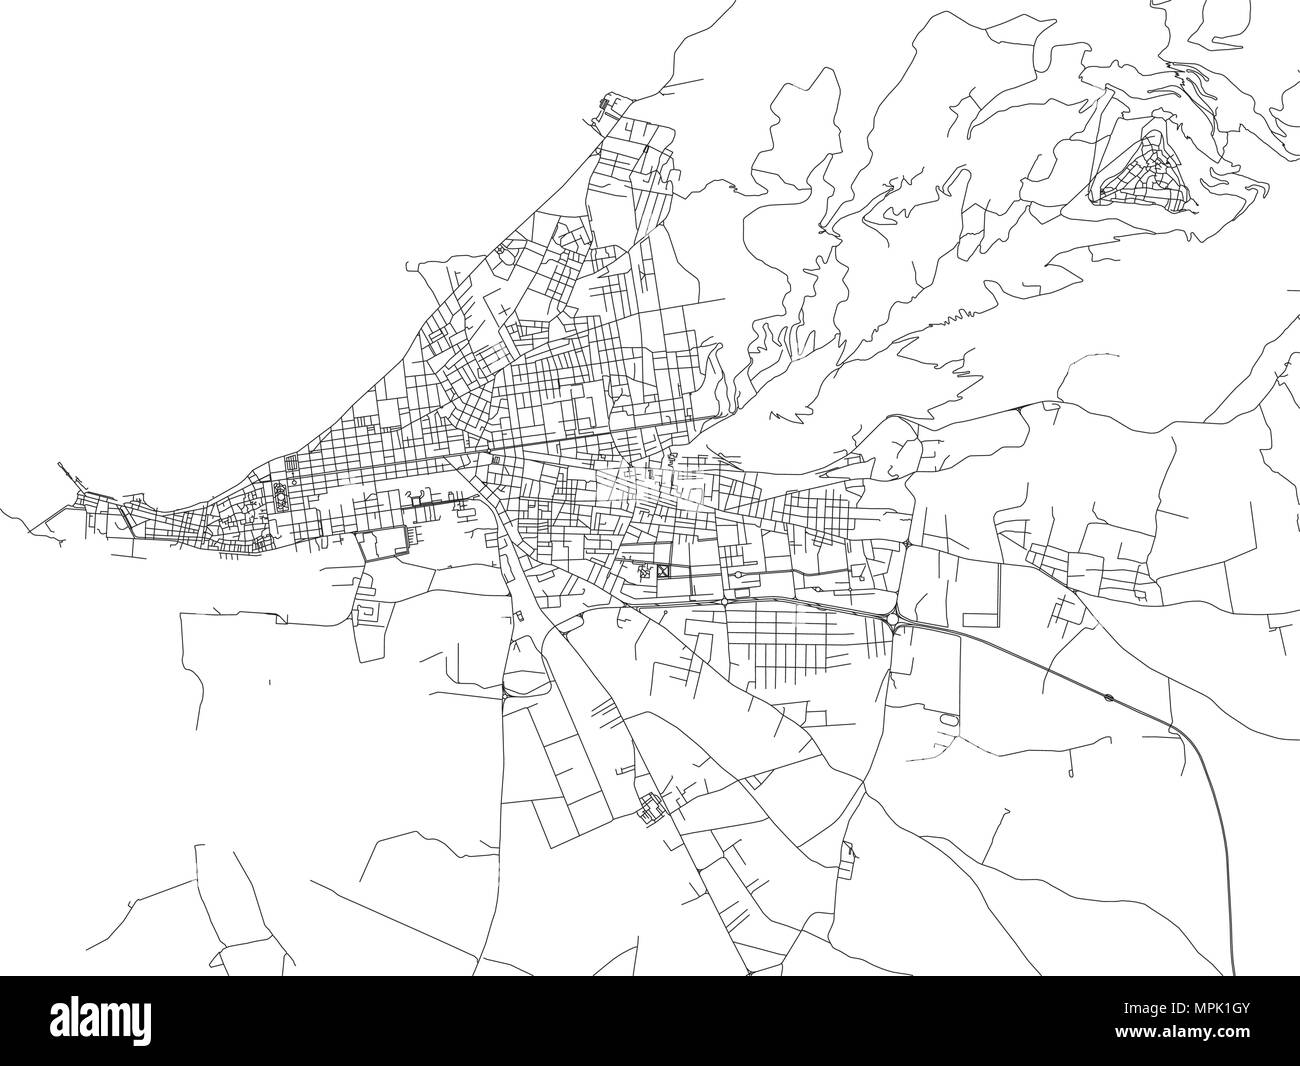 Regional Italy Map.Streets Of Trapani Map Of The City Regional Capital Sicily Italy